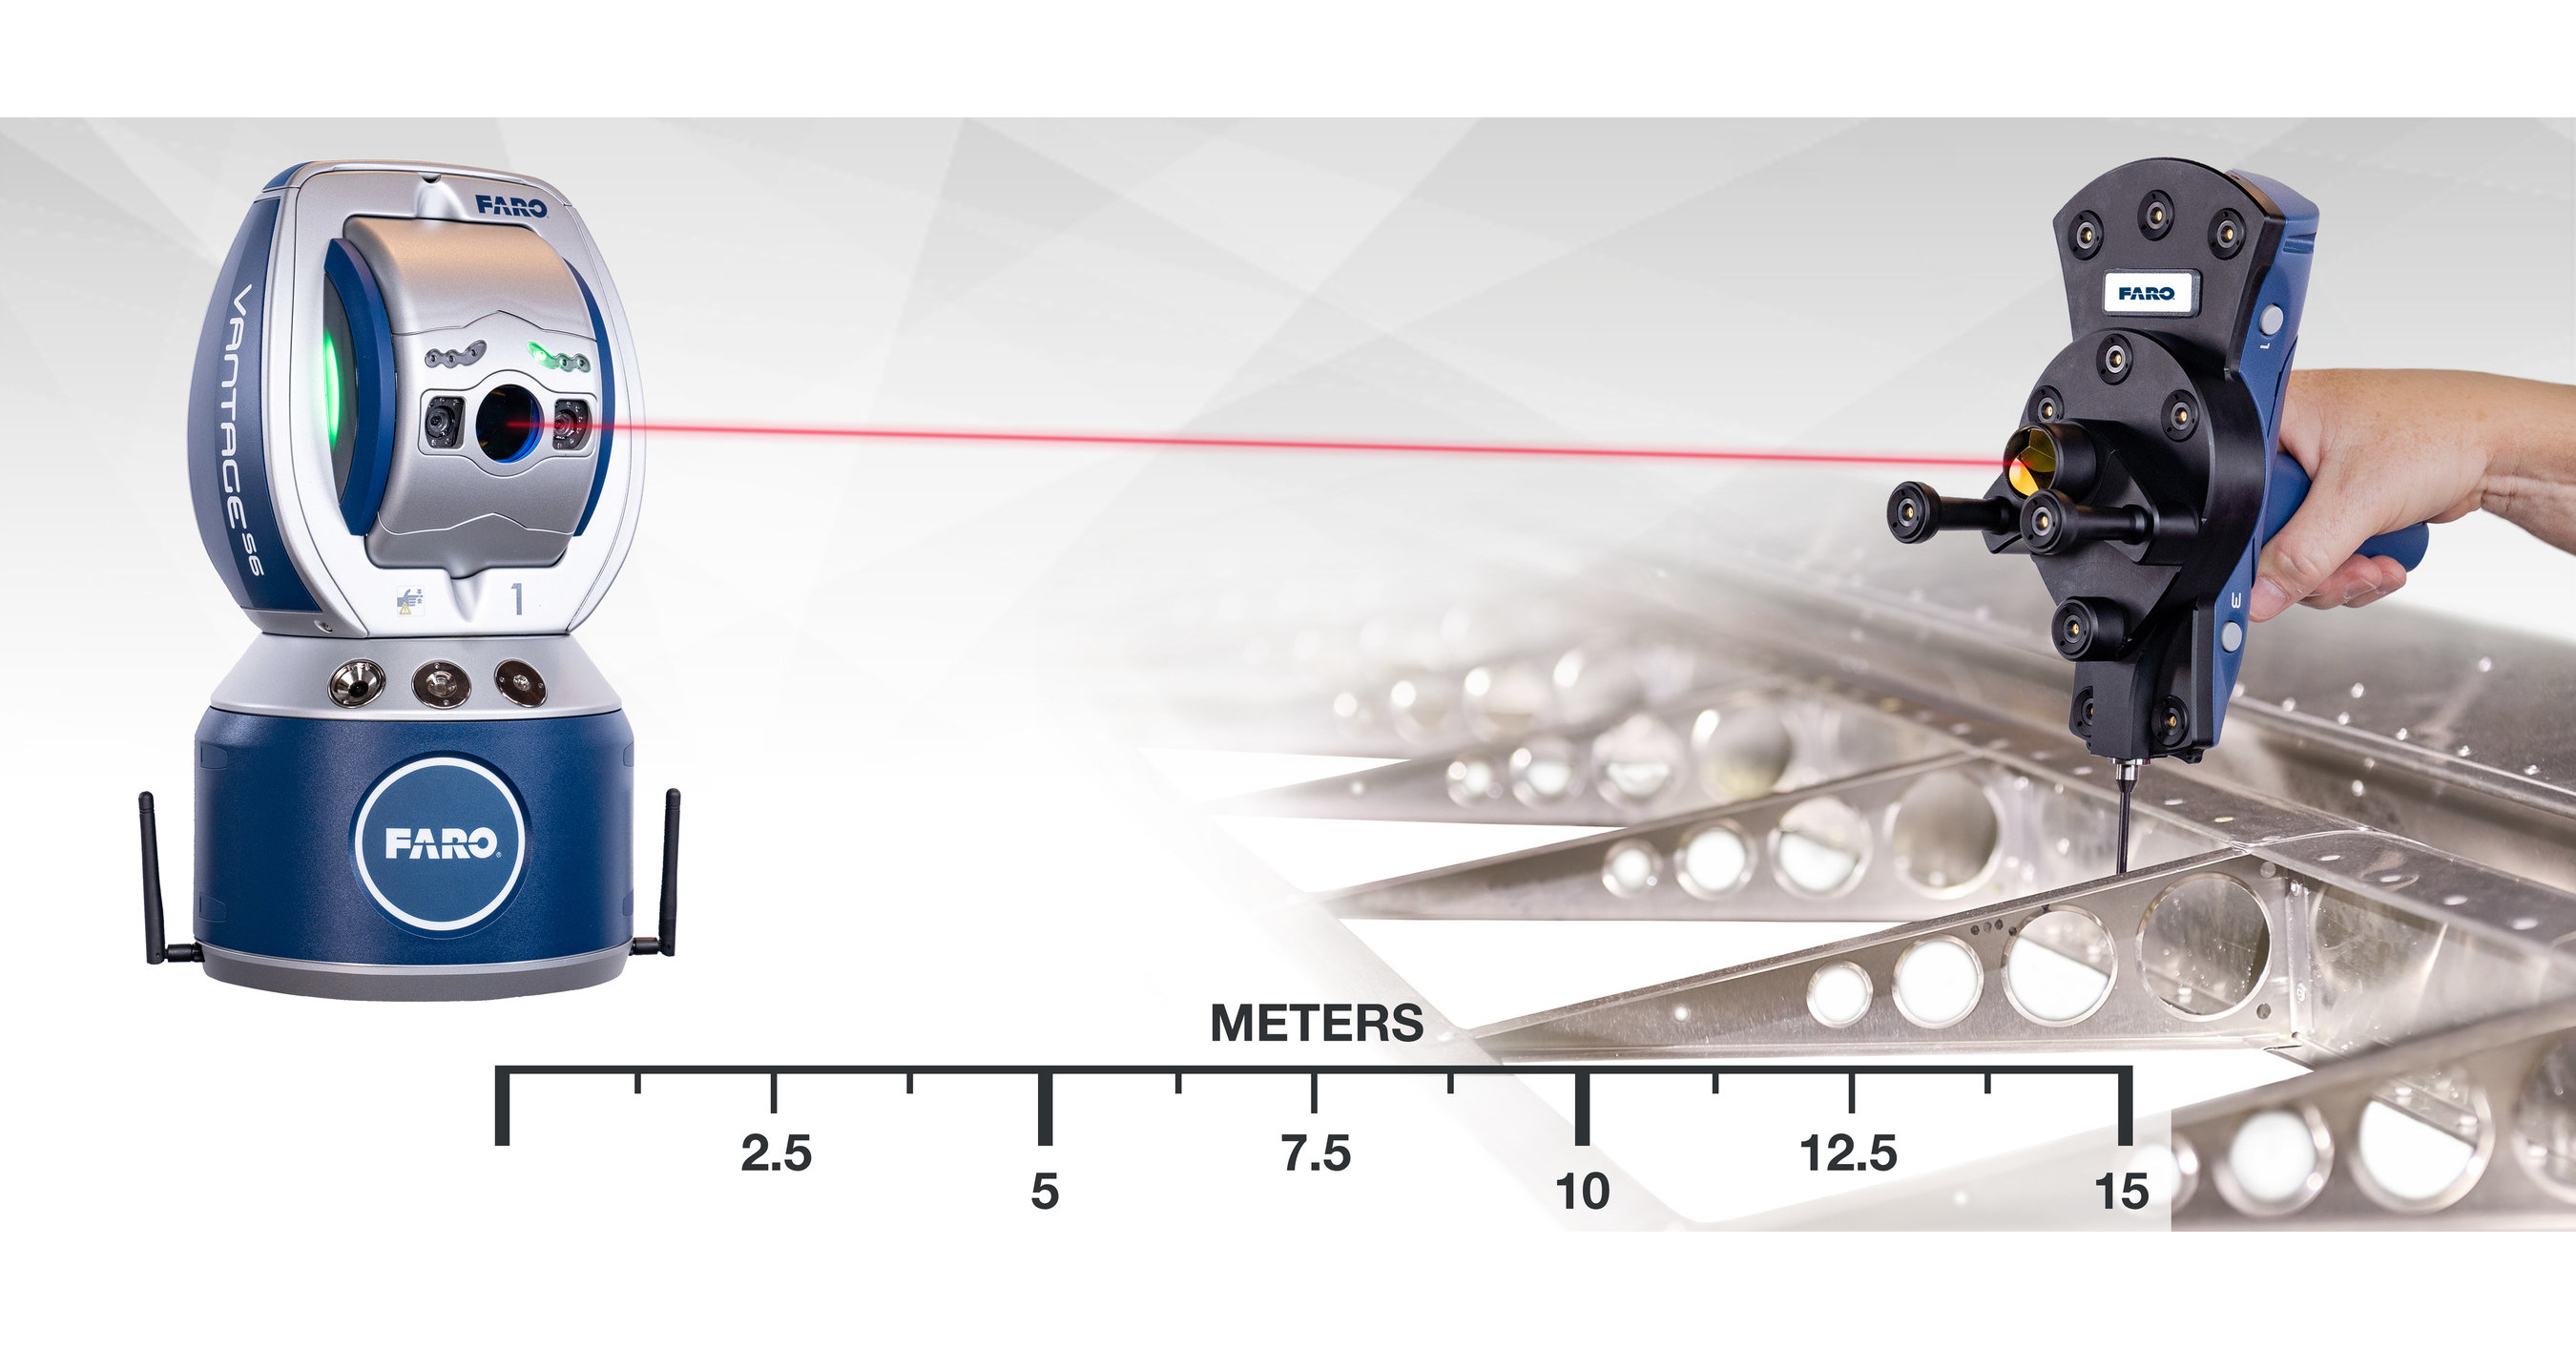 Faro Introduces New 6dof Laser Tracker Platform